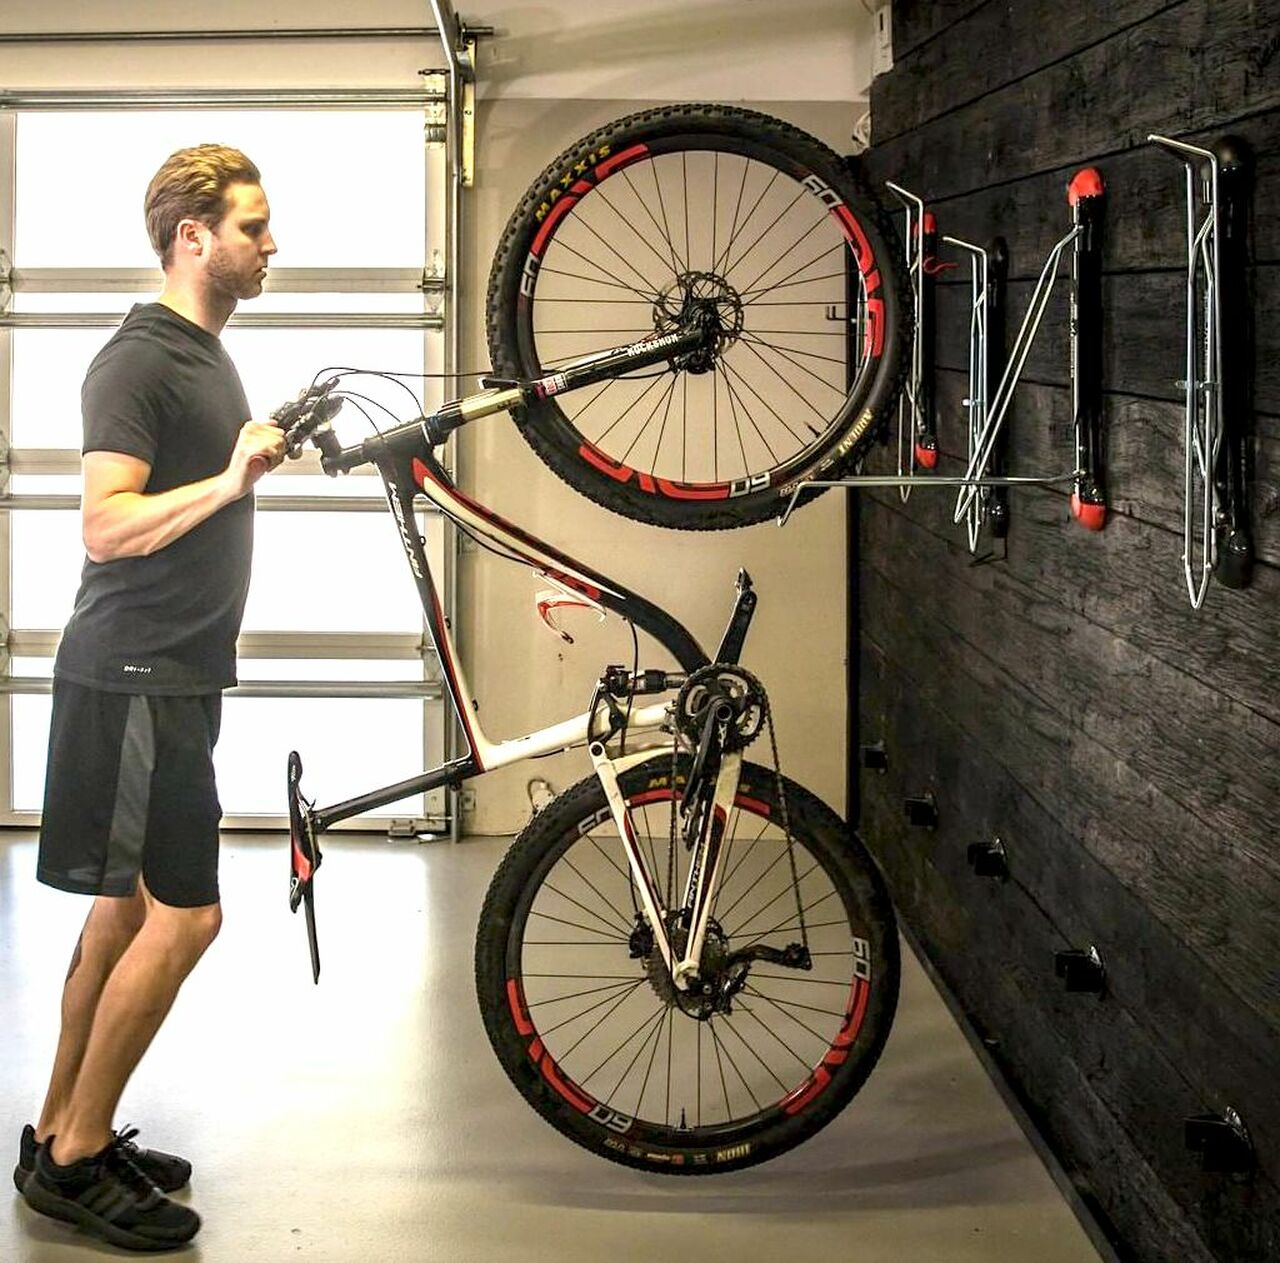 Black Bicycle Mountain Bike Storage Wall Mounted Rack Stands Hanger Hook Tool